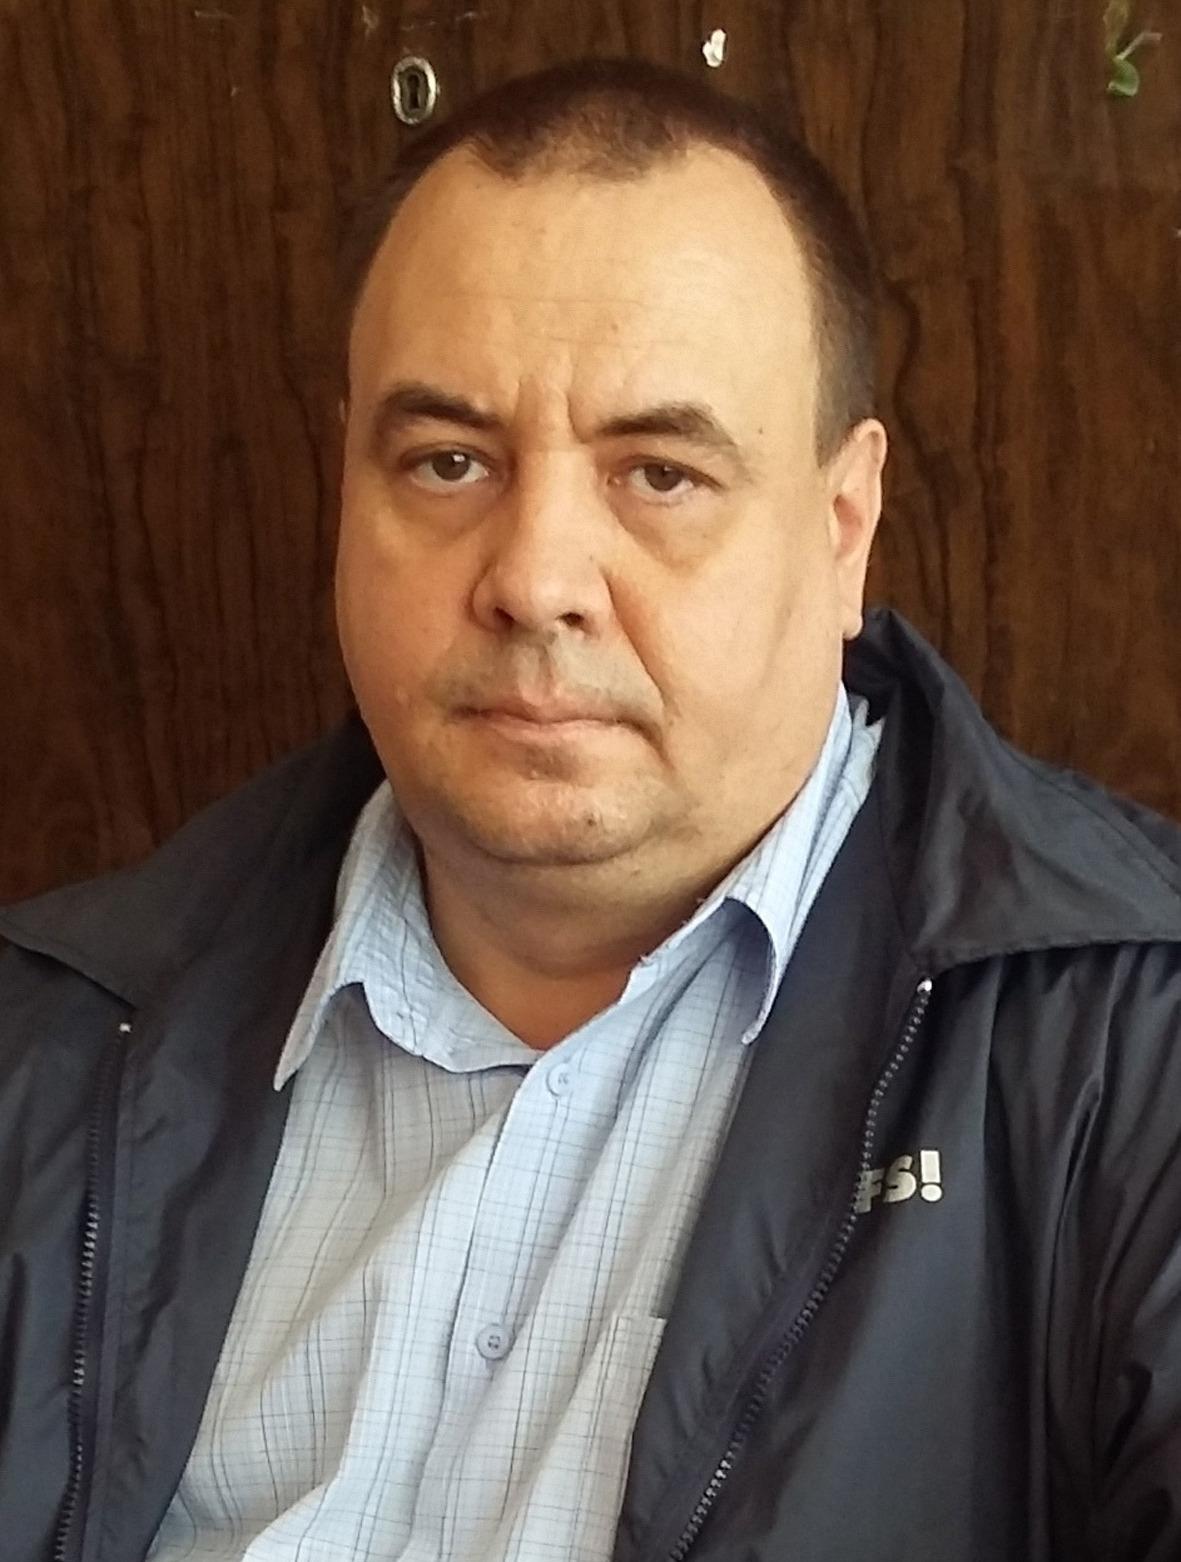 Товарниченко Володимир Олександрович